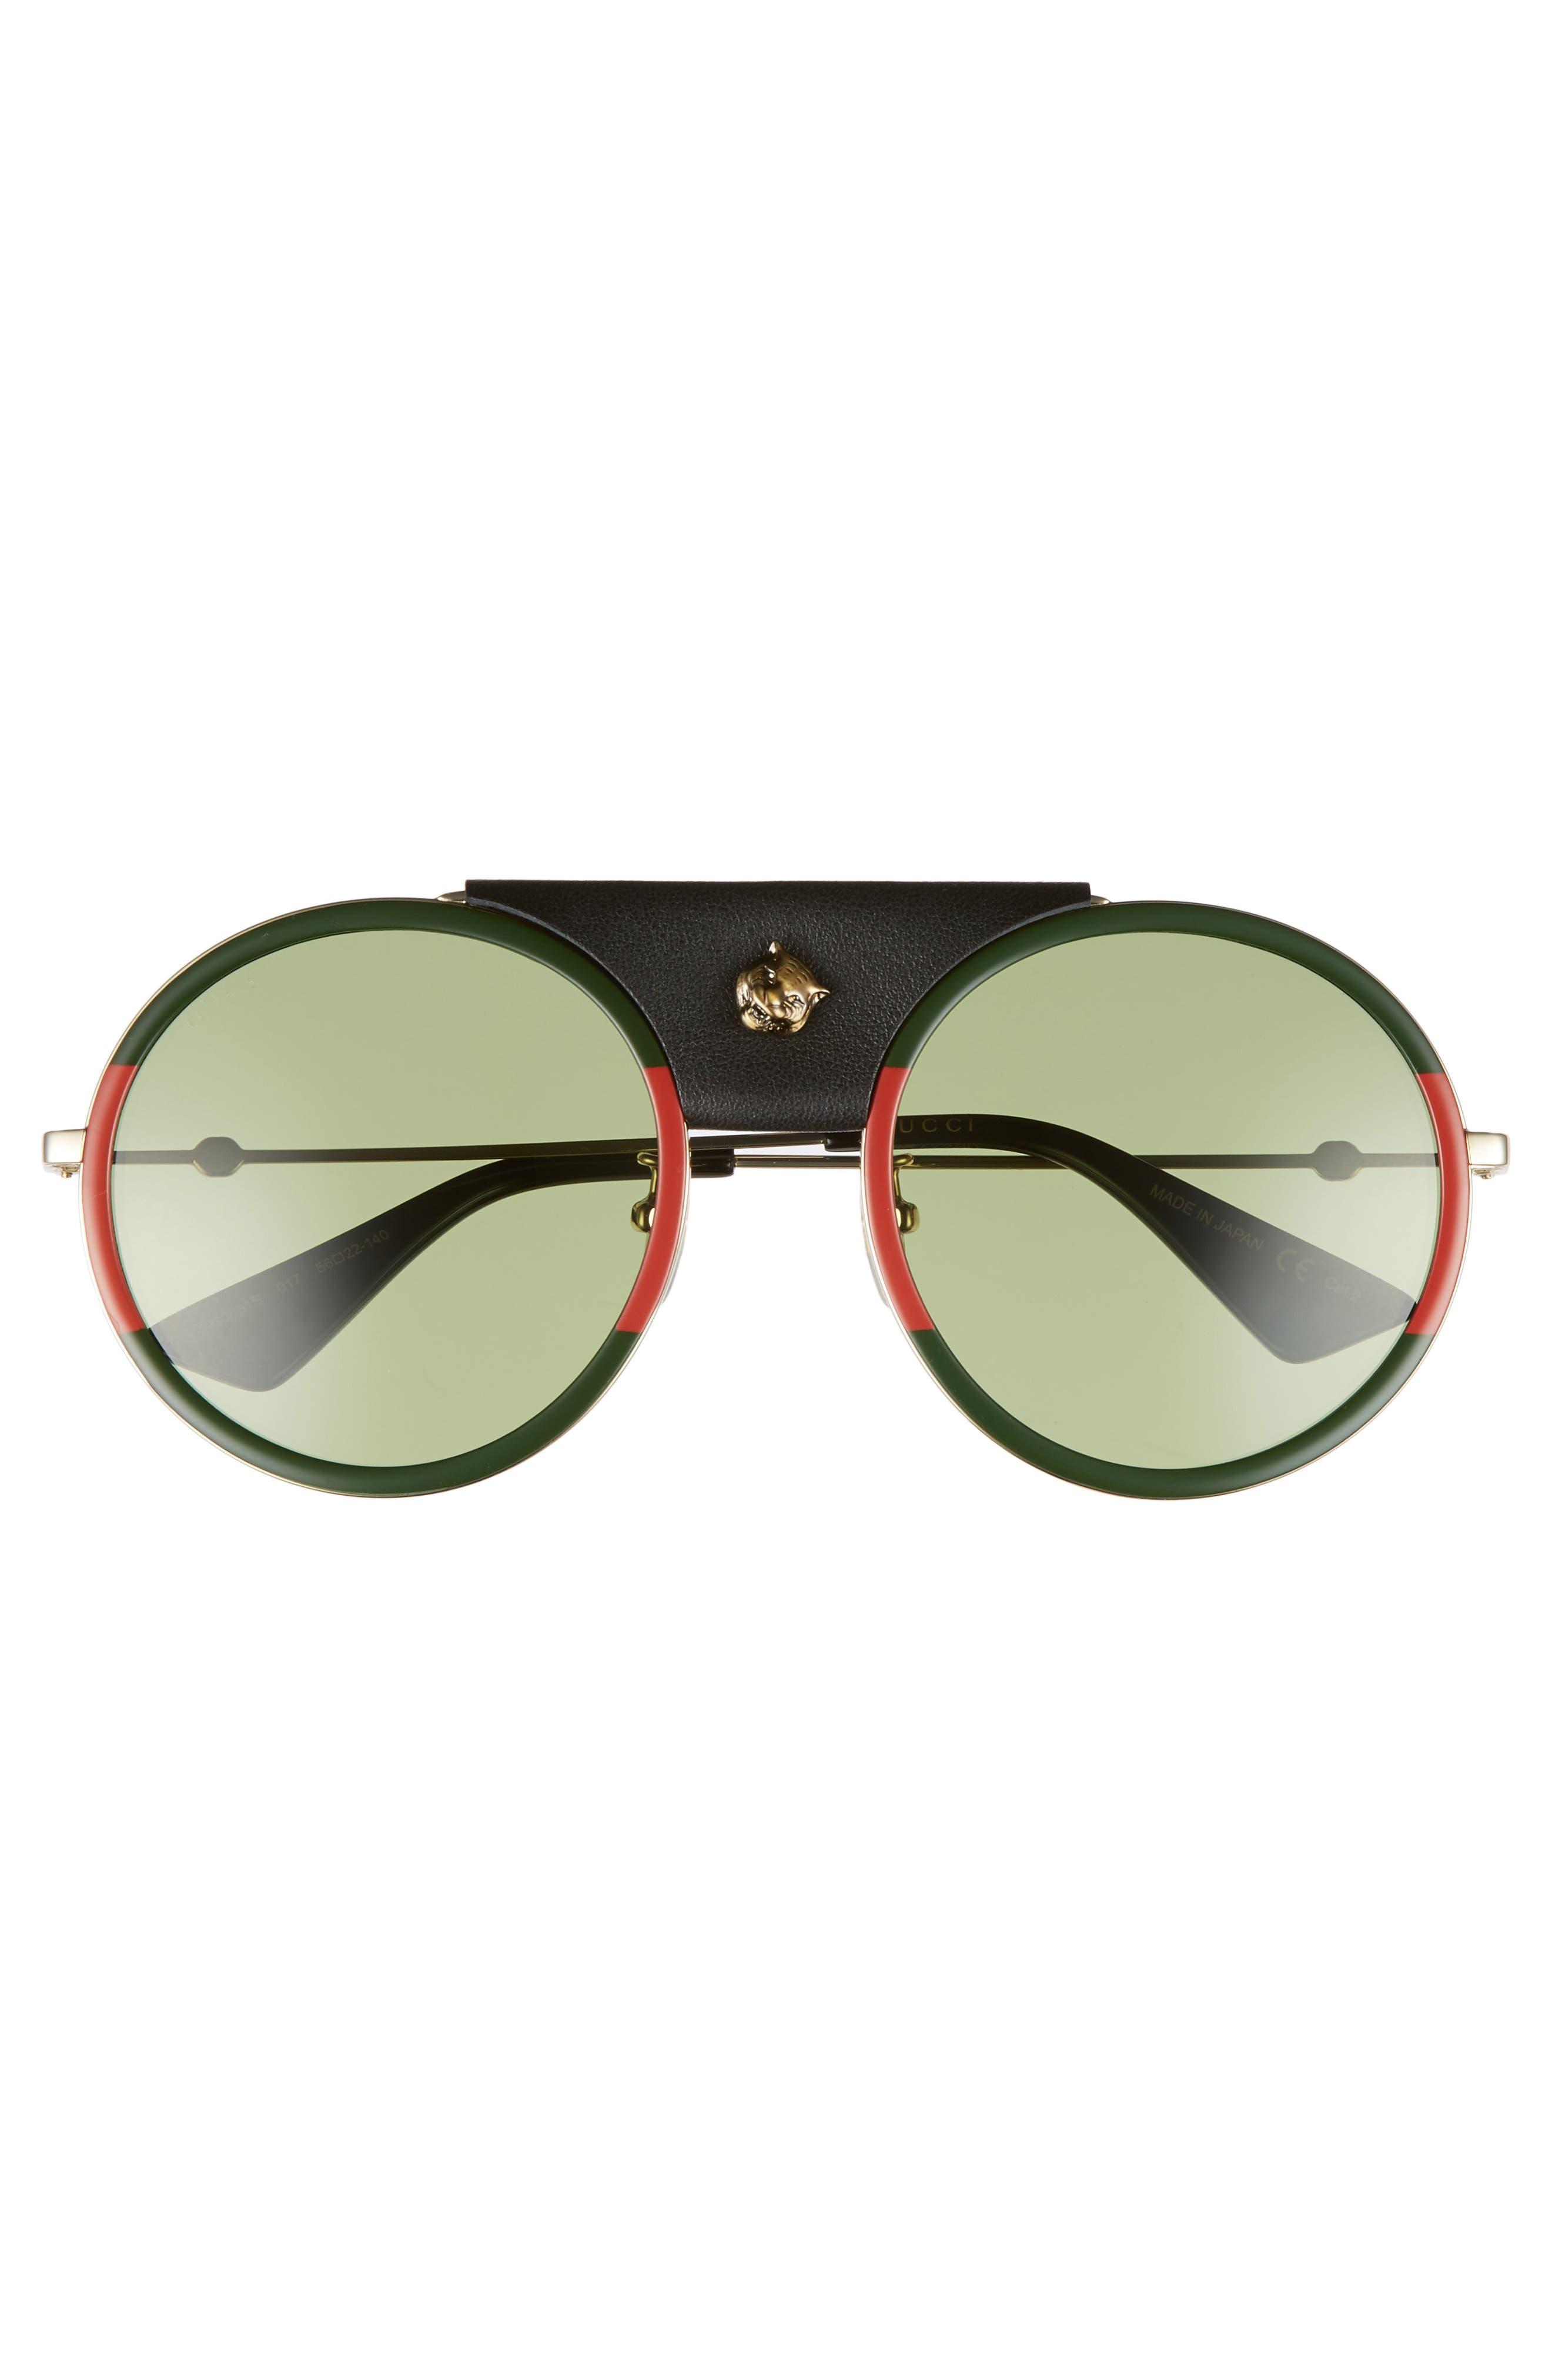 56mm Leather Bridge Aviator Sunglasses,                             Alternate thumbnail 3, color,                             Gold/ Black